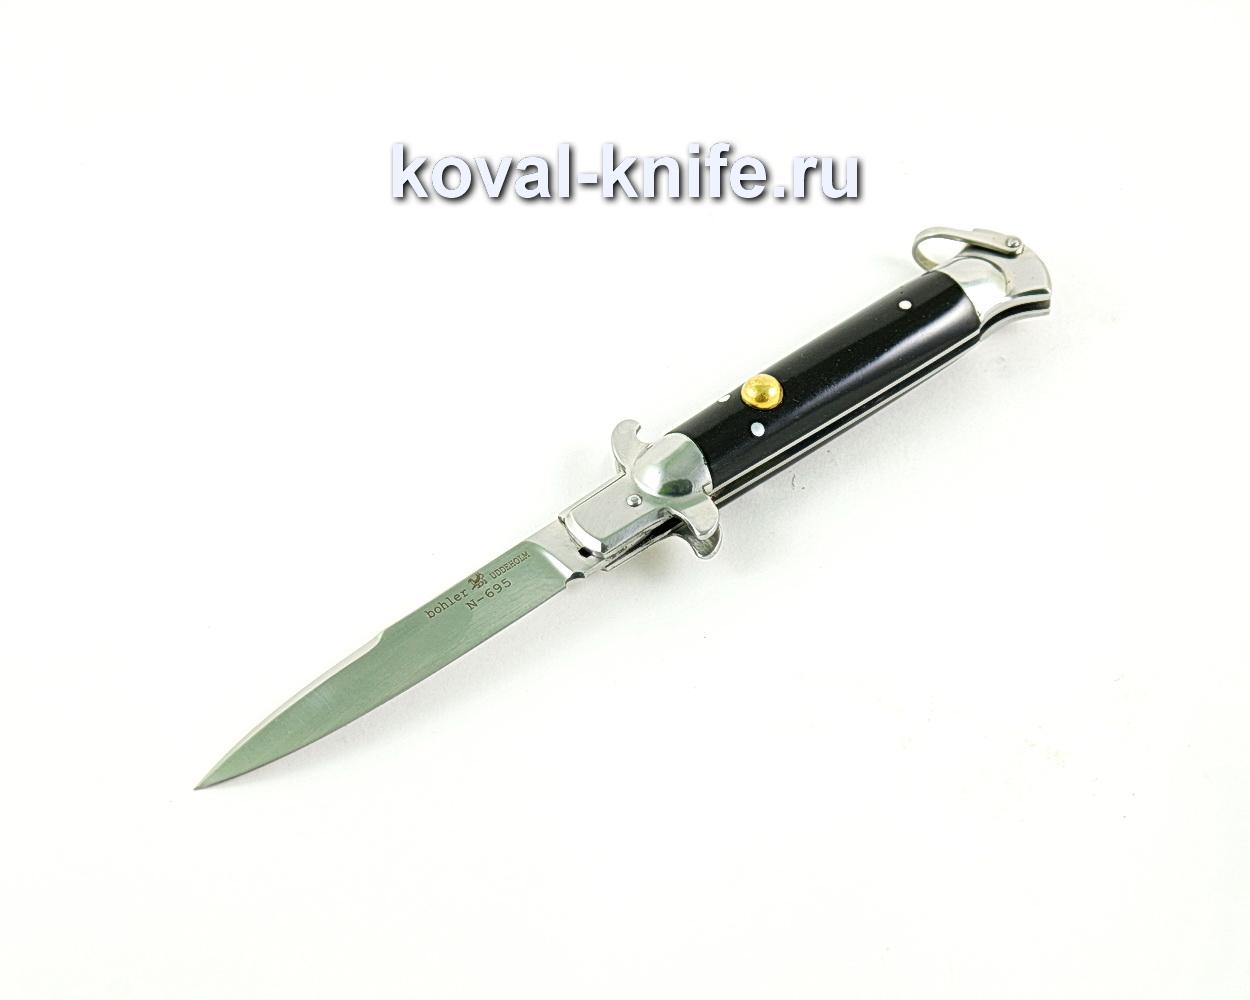 Нож Флинт (сталь N-695), рукоять эбонит A327